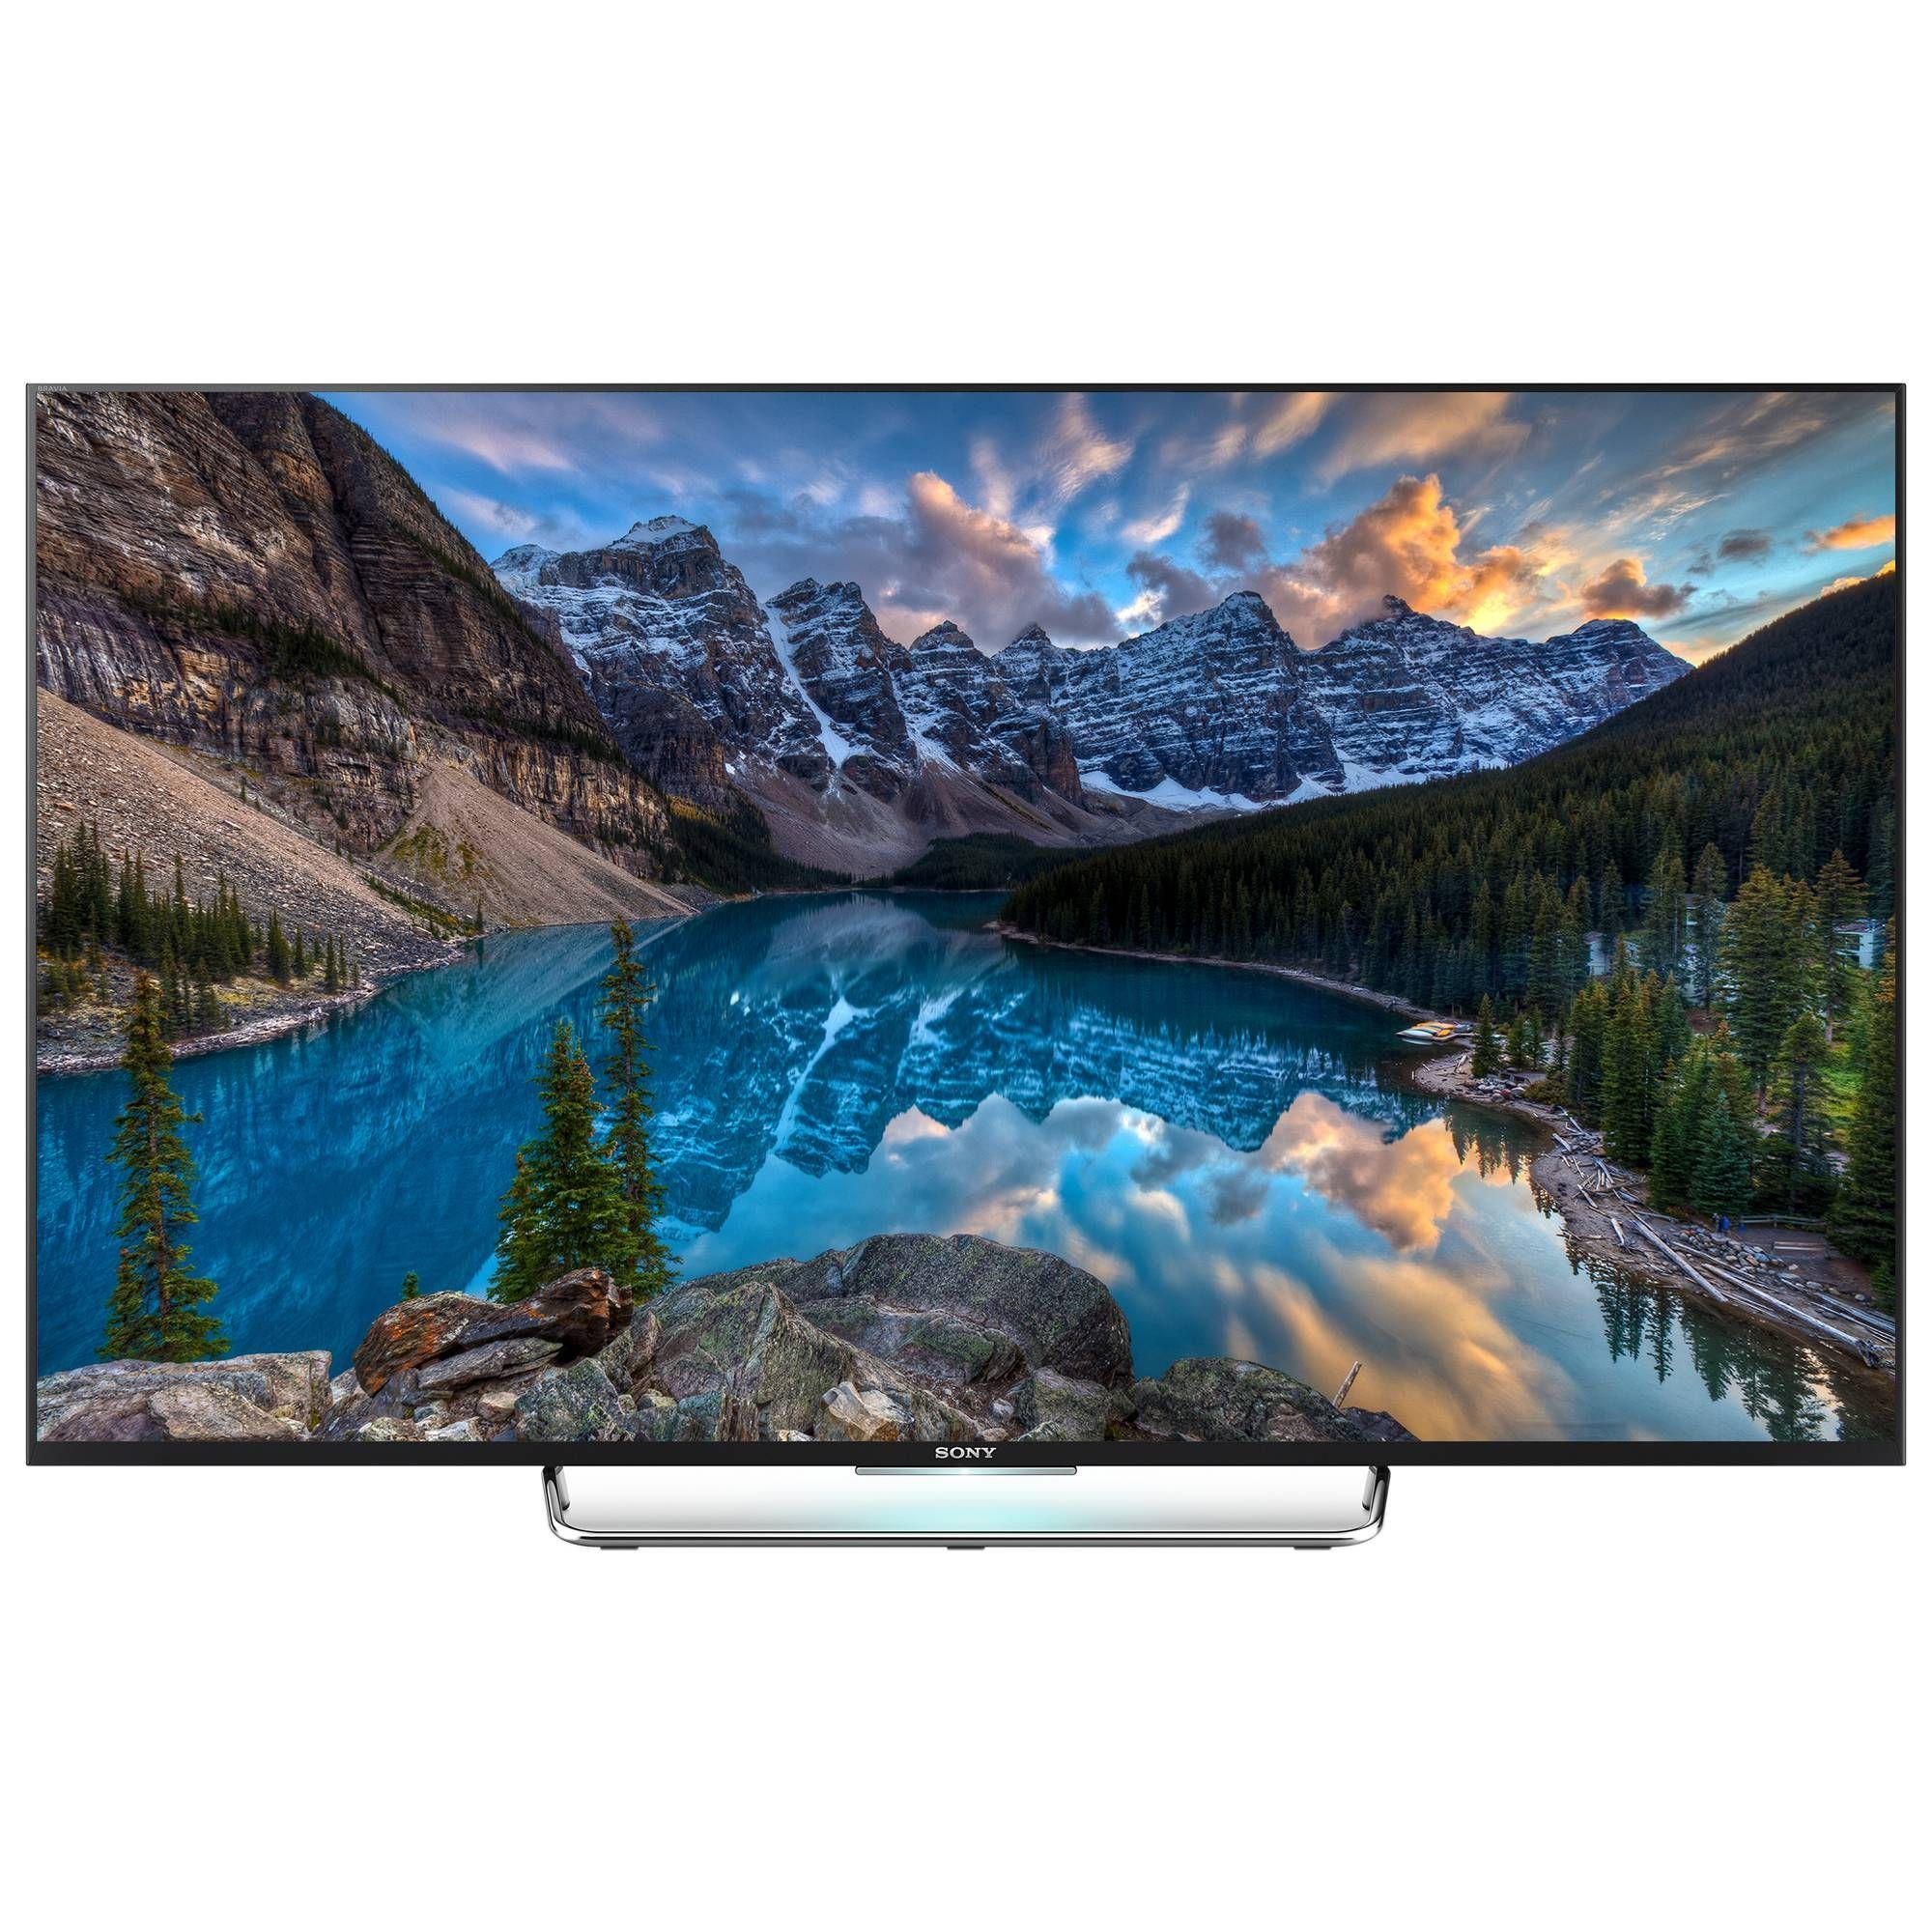 Televizor Smart Android 3d Led Sony Bravia 43w808c 43 108 Sm Full Hd Potopete Se Vv Vodesho V Klasa Si Full Hd Kachestvo Na Ka Sony Led Sony Led Tv Led Tv